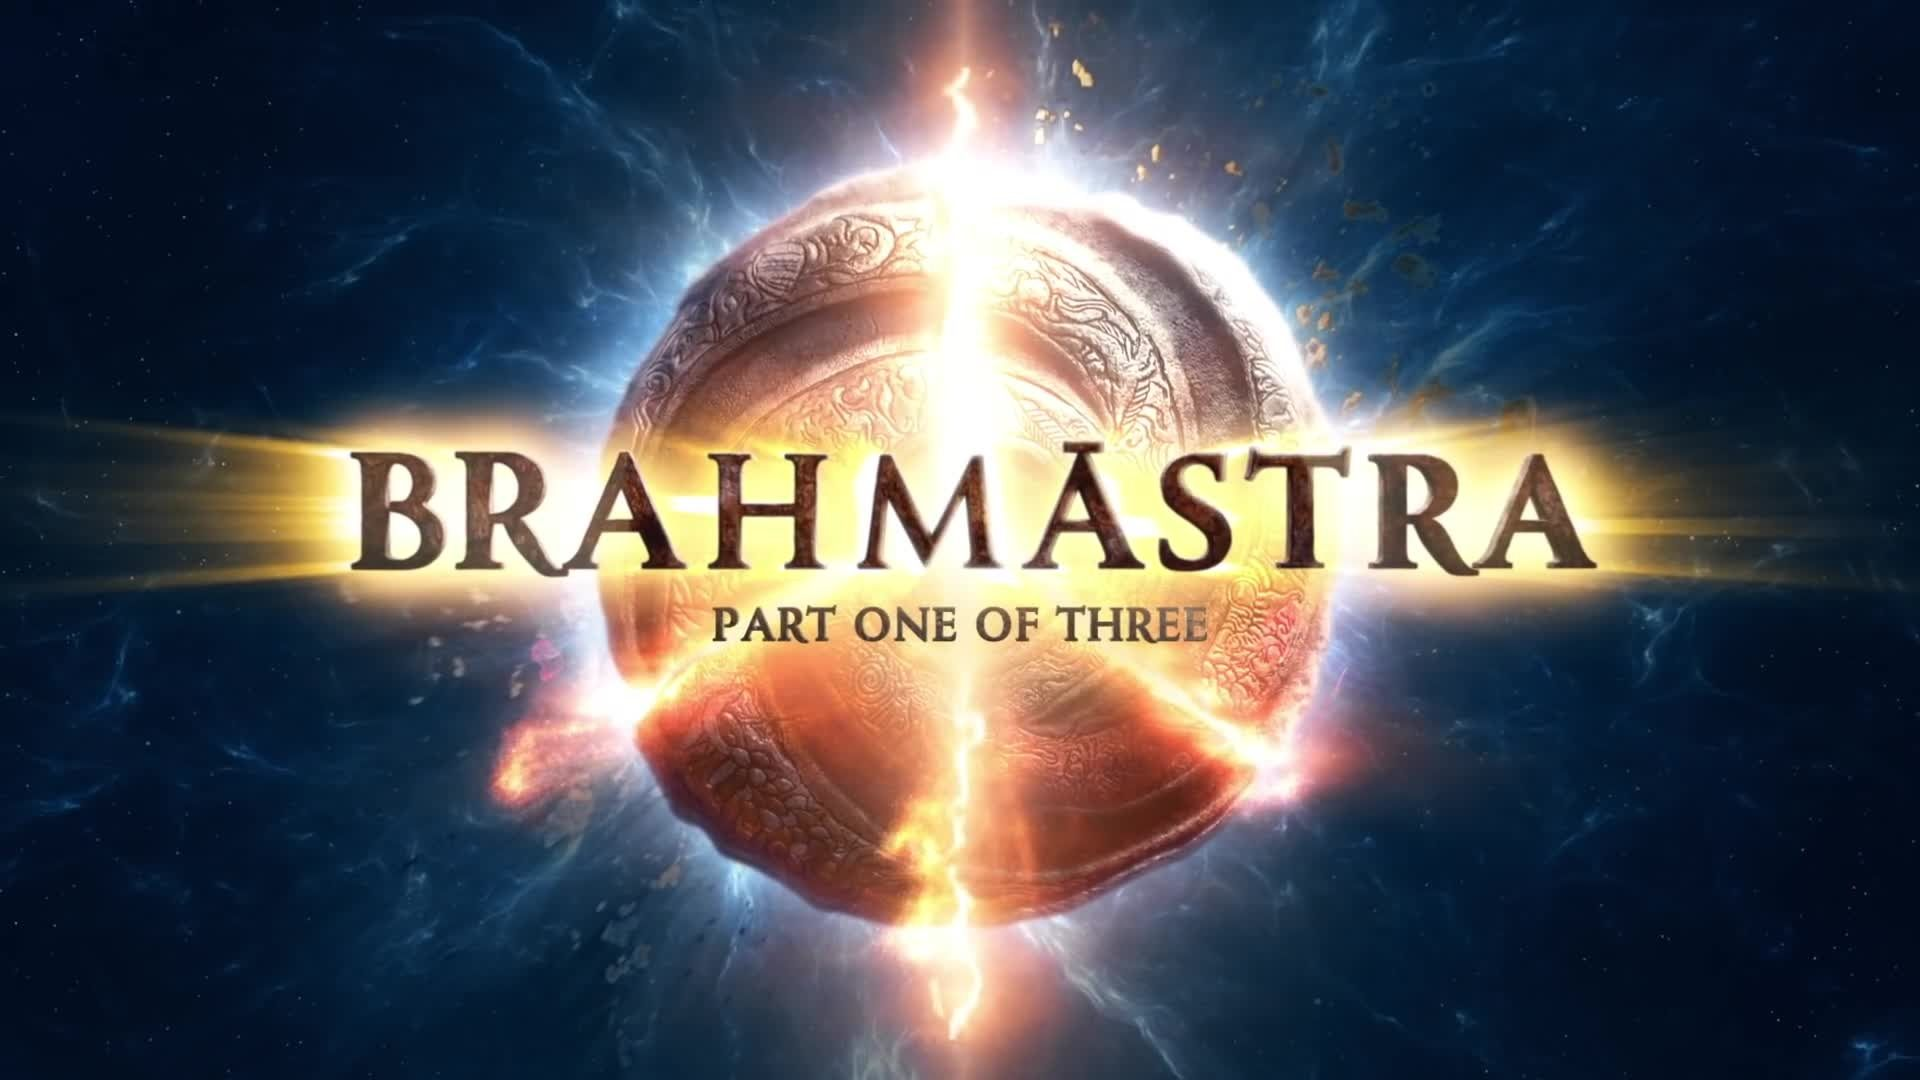 Brahmastra Film